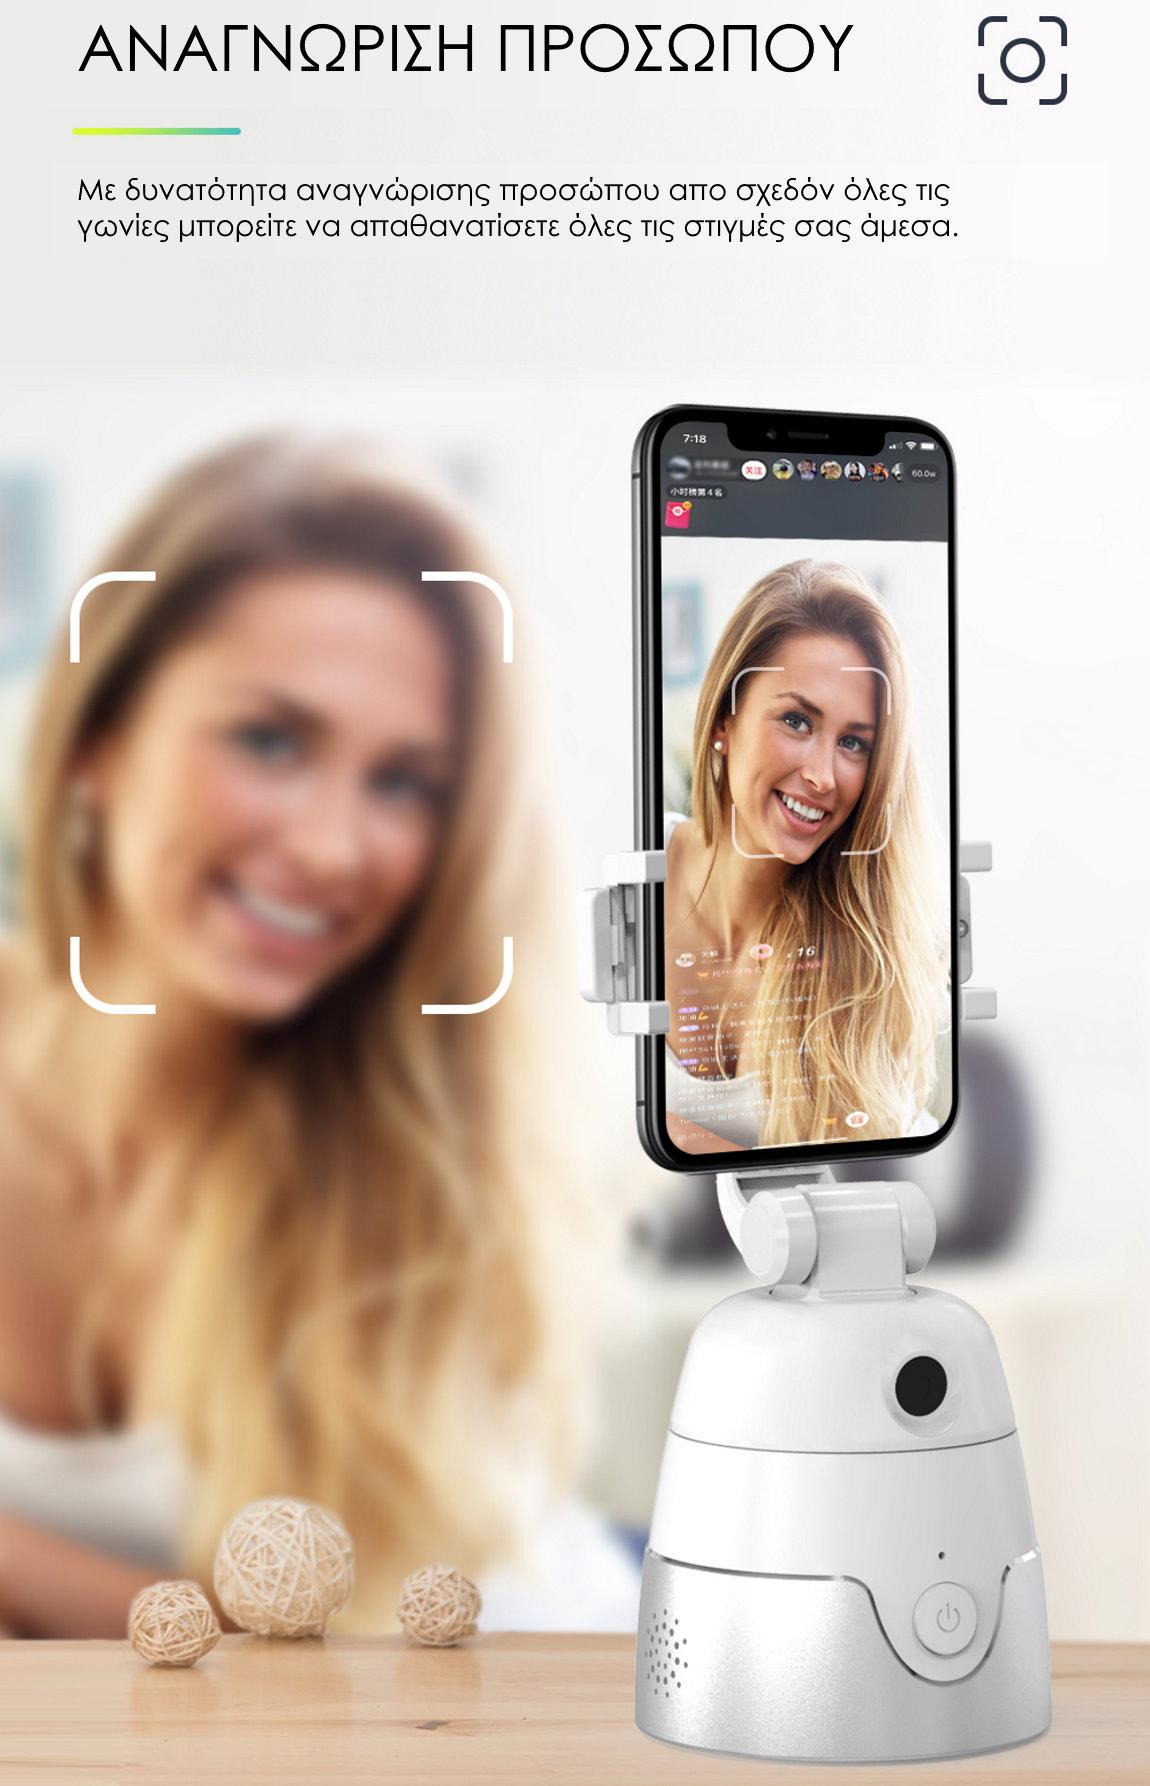 AI Smart Follow Shooting αναγνώριση προσώπου